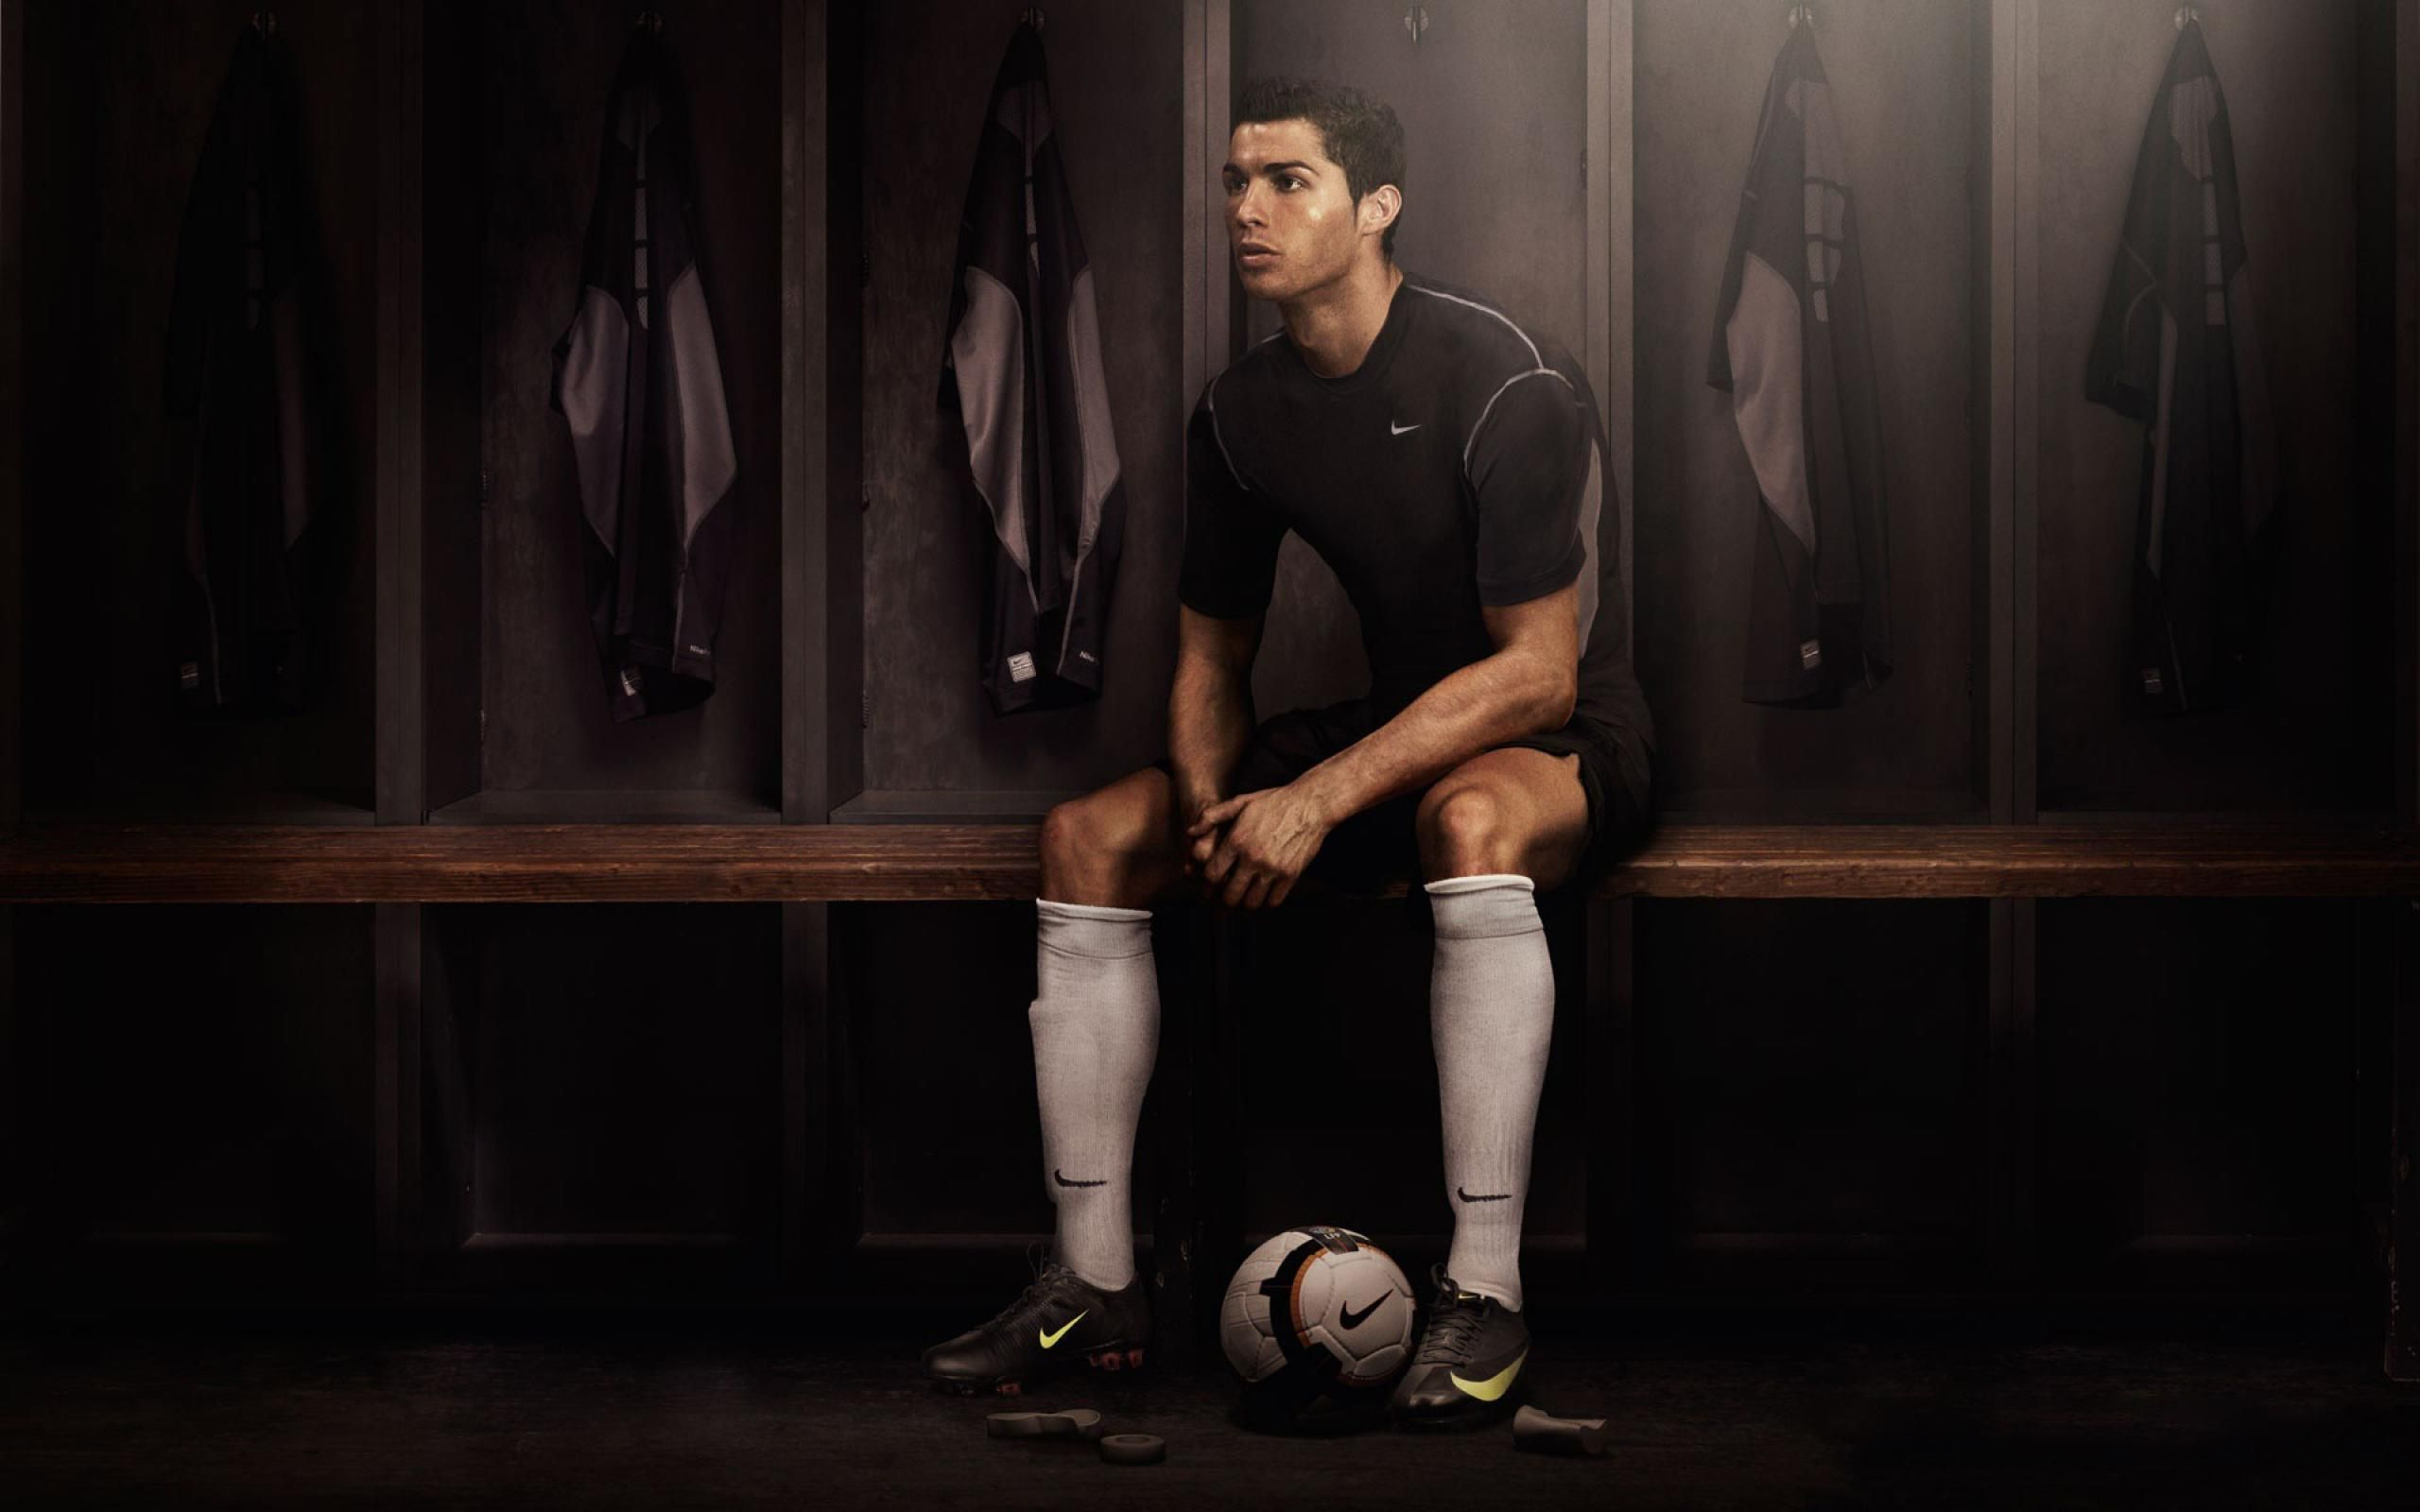 Cristiano Ronaldo Nike Wallpaper 2 Alx Ronaldo Wallpapers